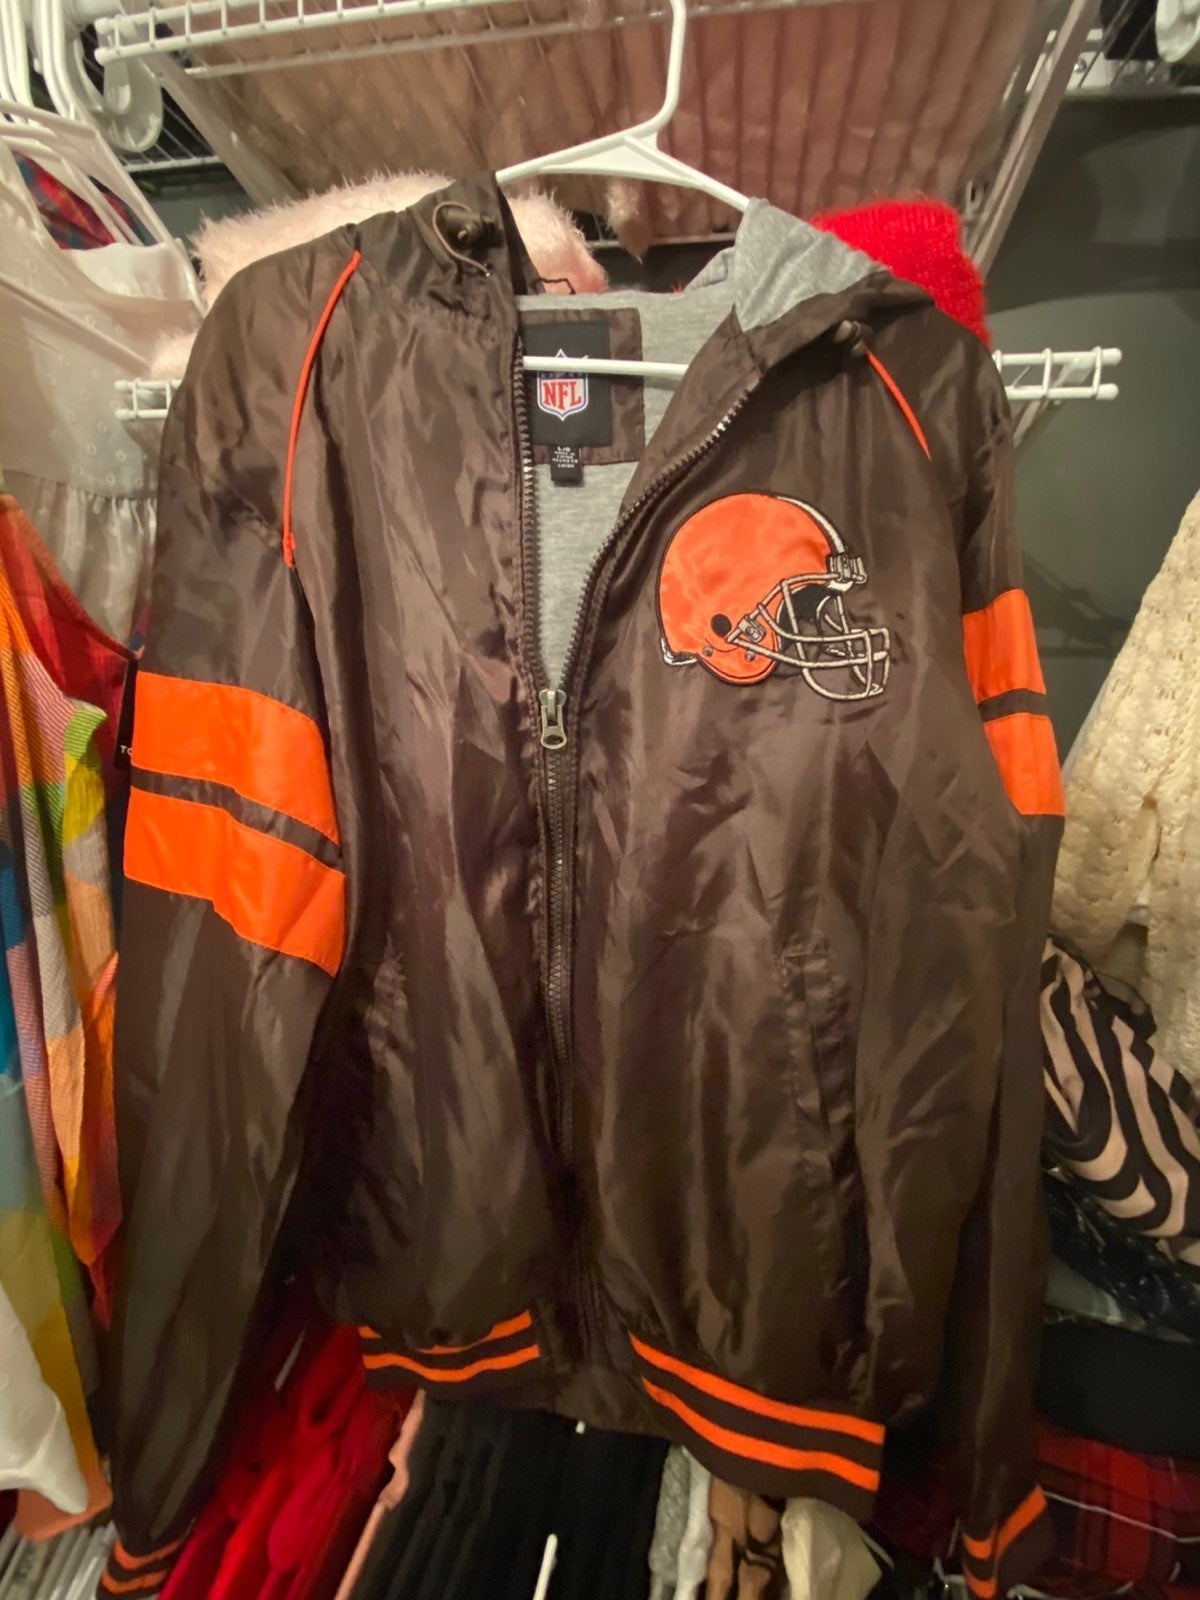 Unisex Cleveland Browns Jacket